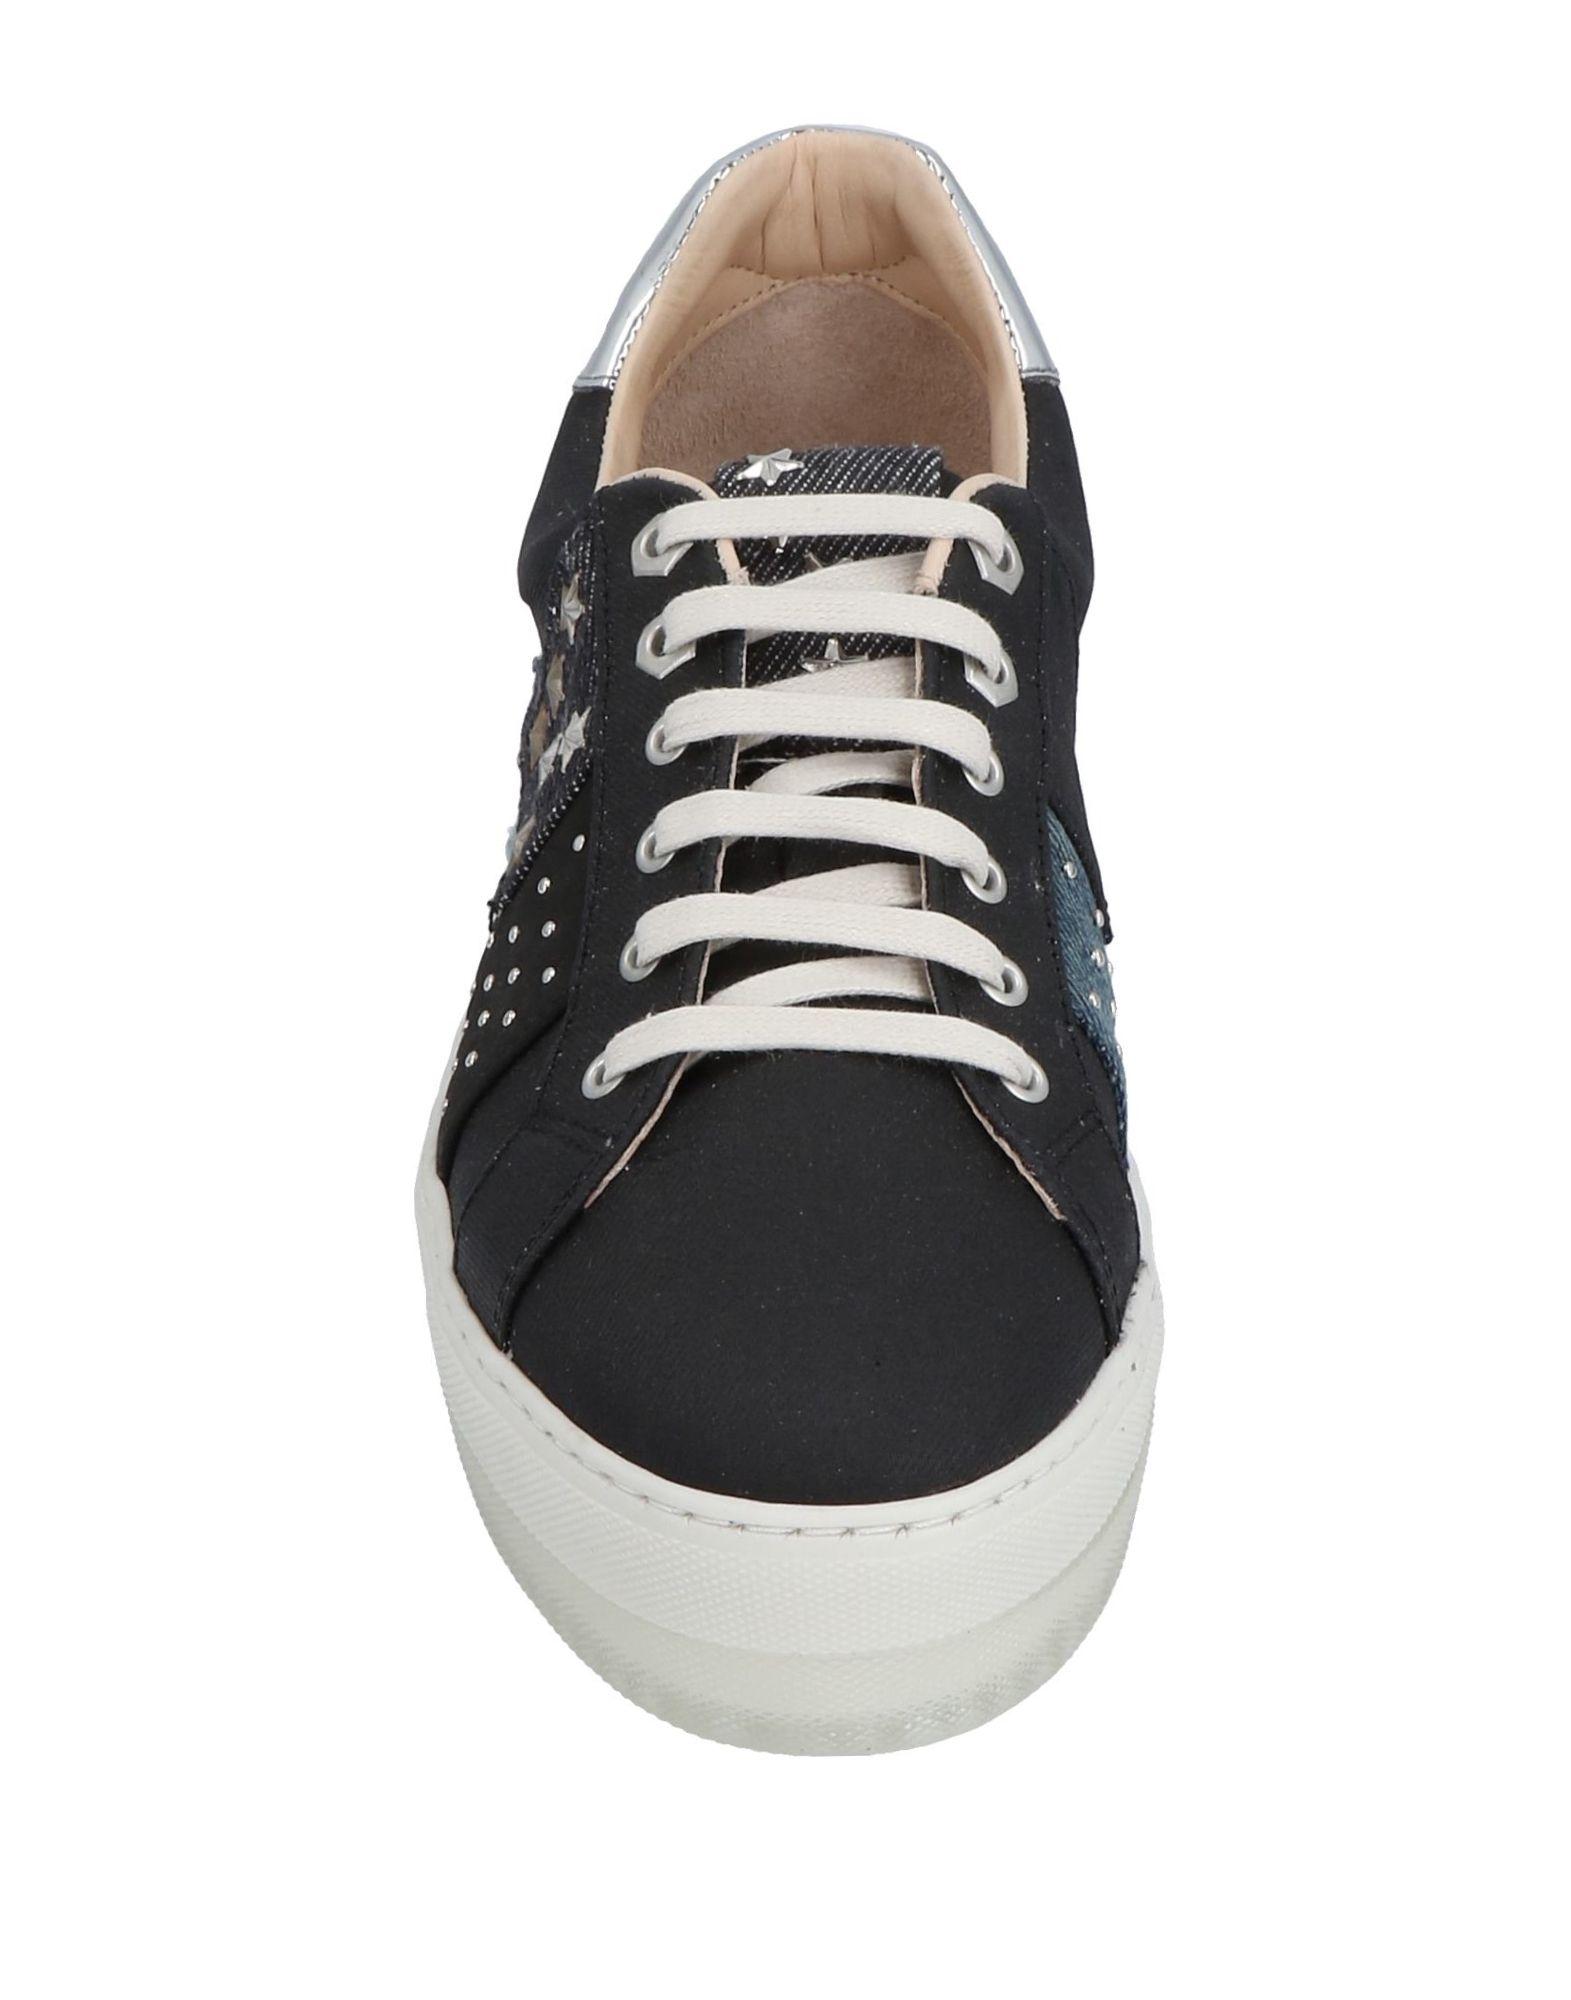 Diesel Sneakers Damen  11496079NS Gute Qualität beliebte Schuhe